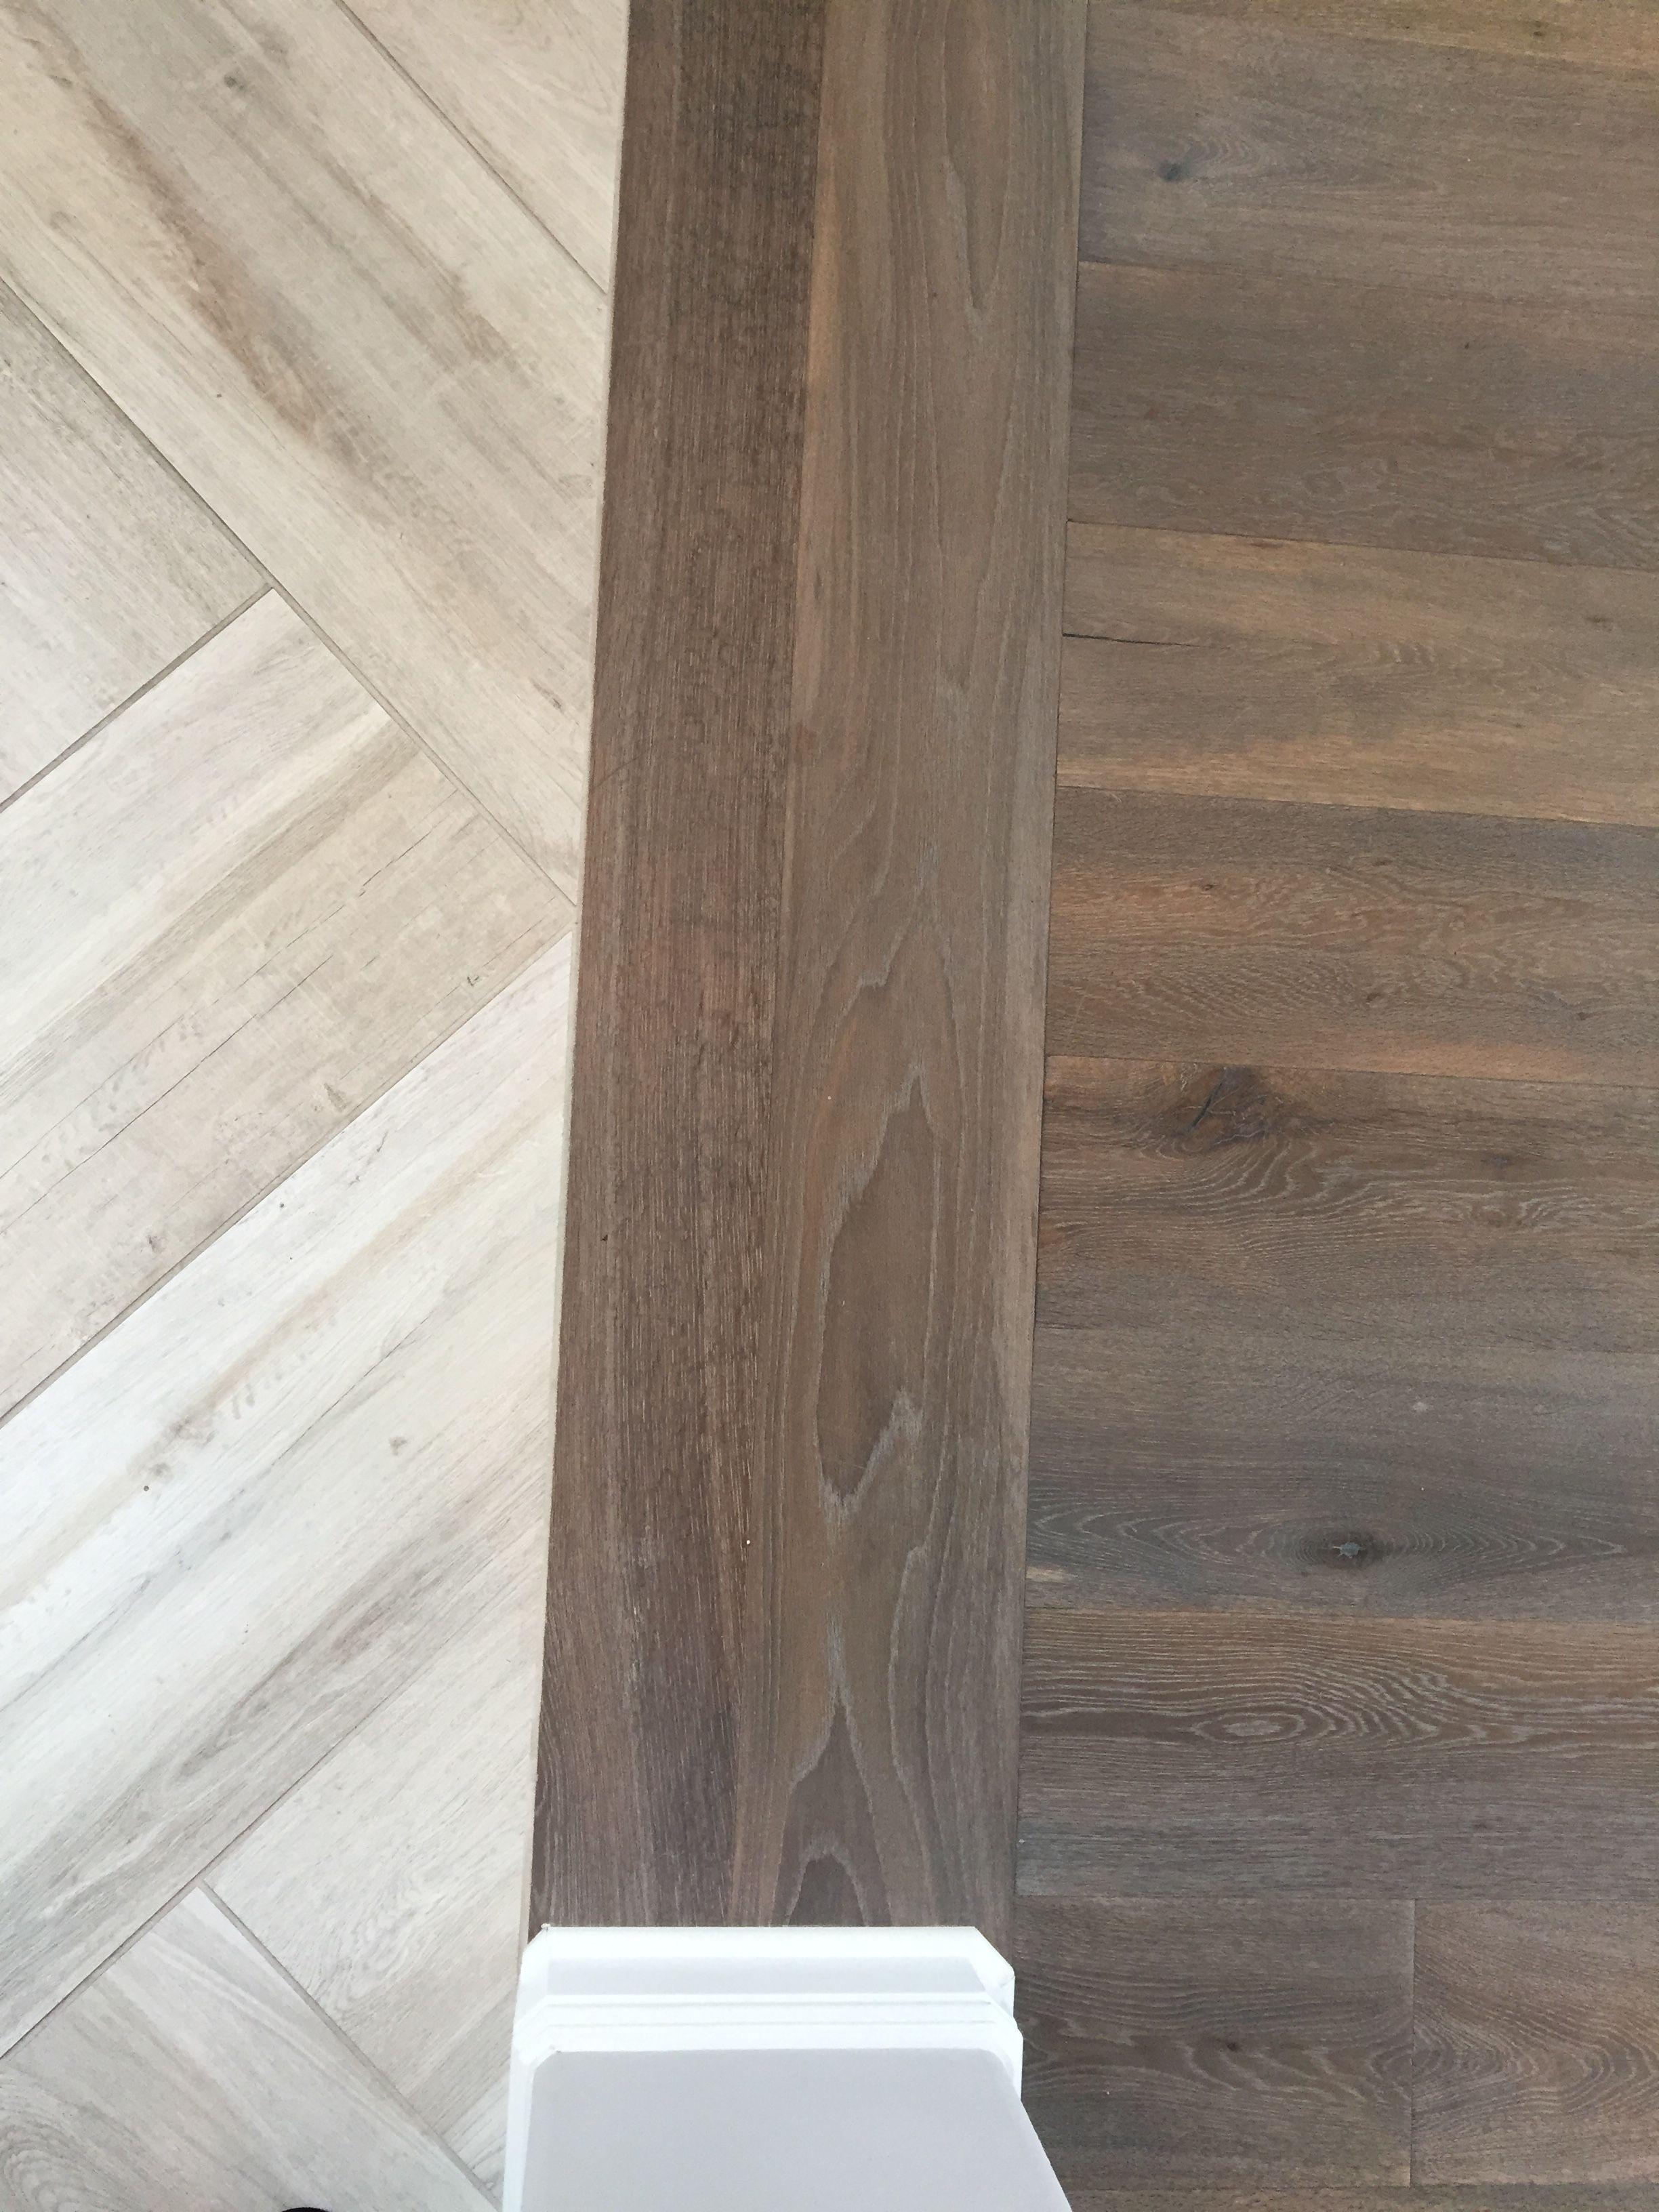 hardwood floor over tile of floor transition laminate to herringbone tile pattern model with regard to floor transition laminate to herringbone tile pattern